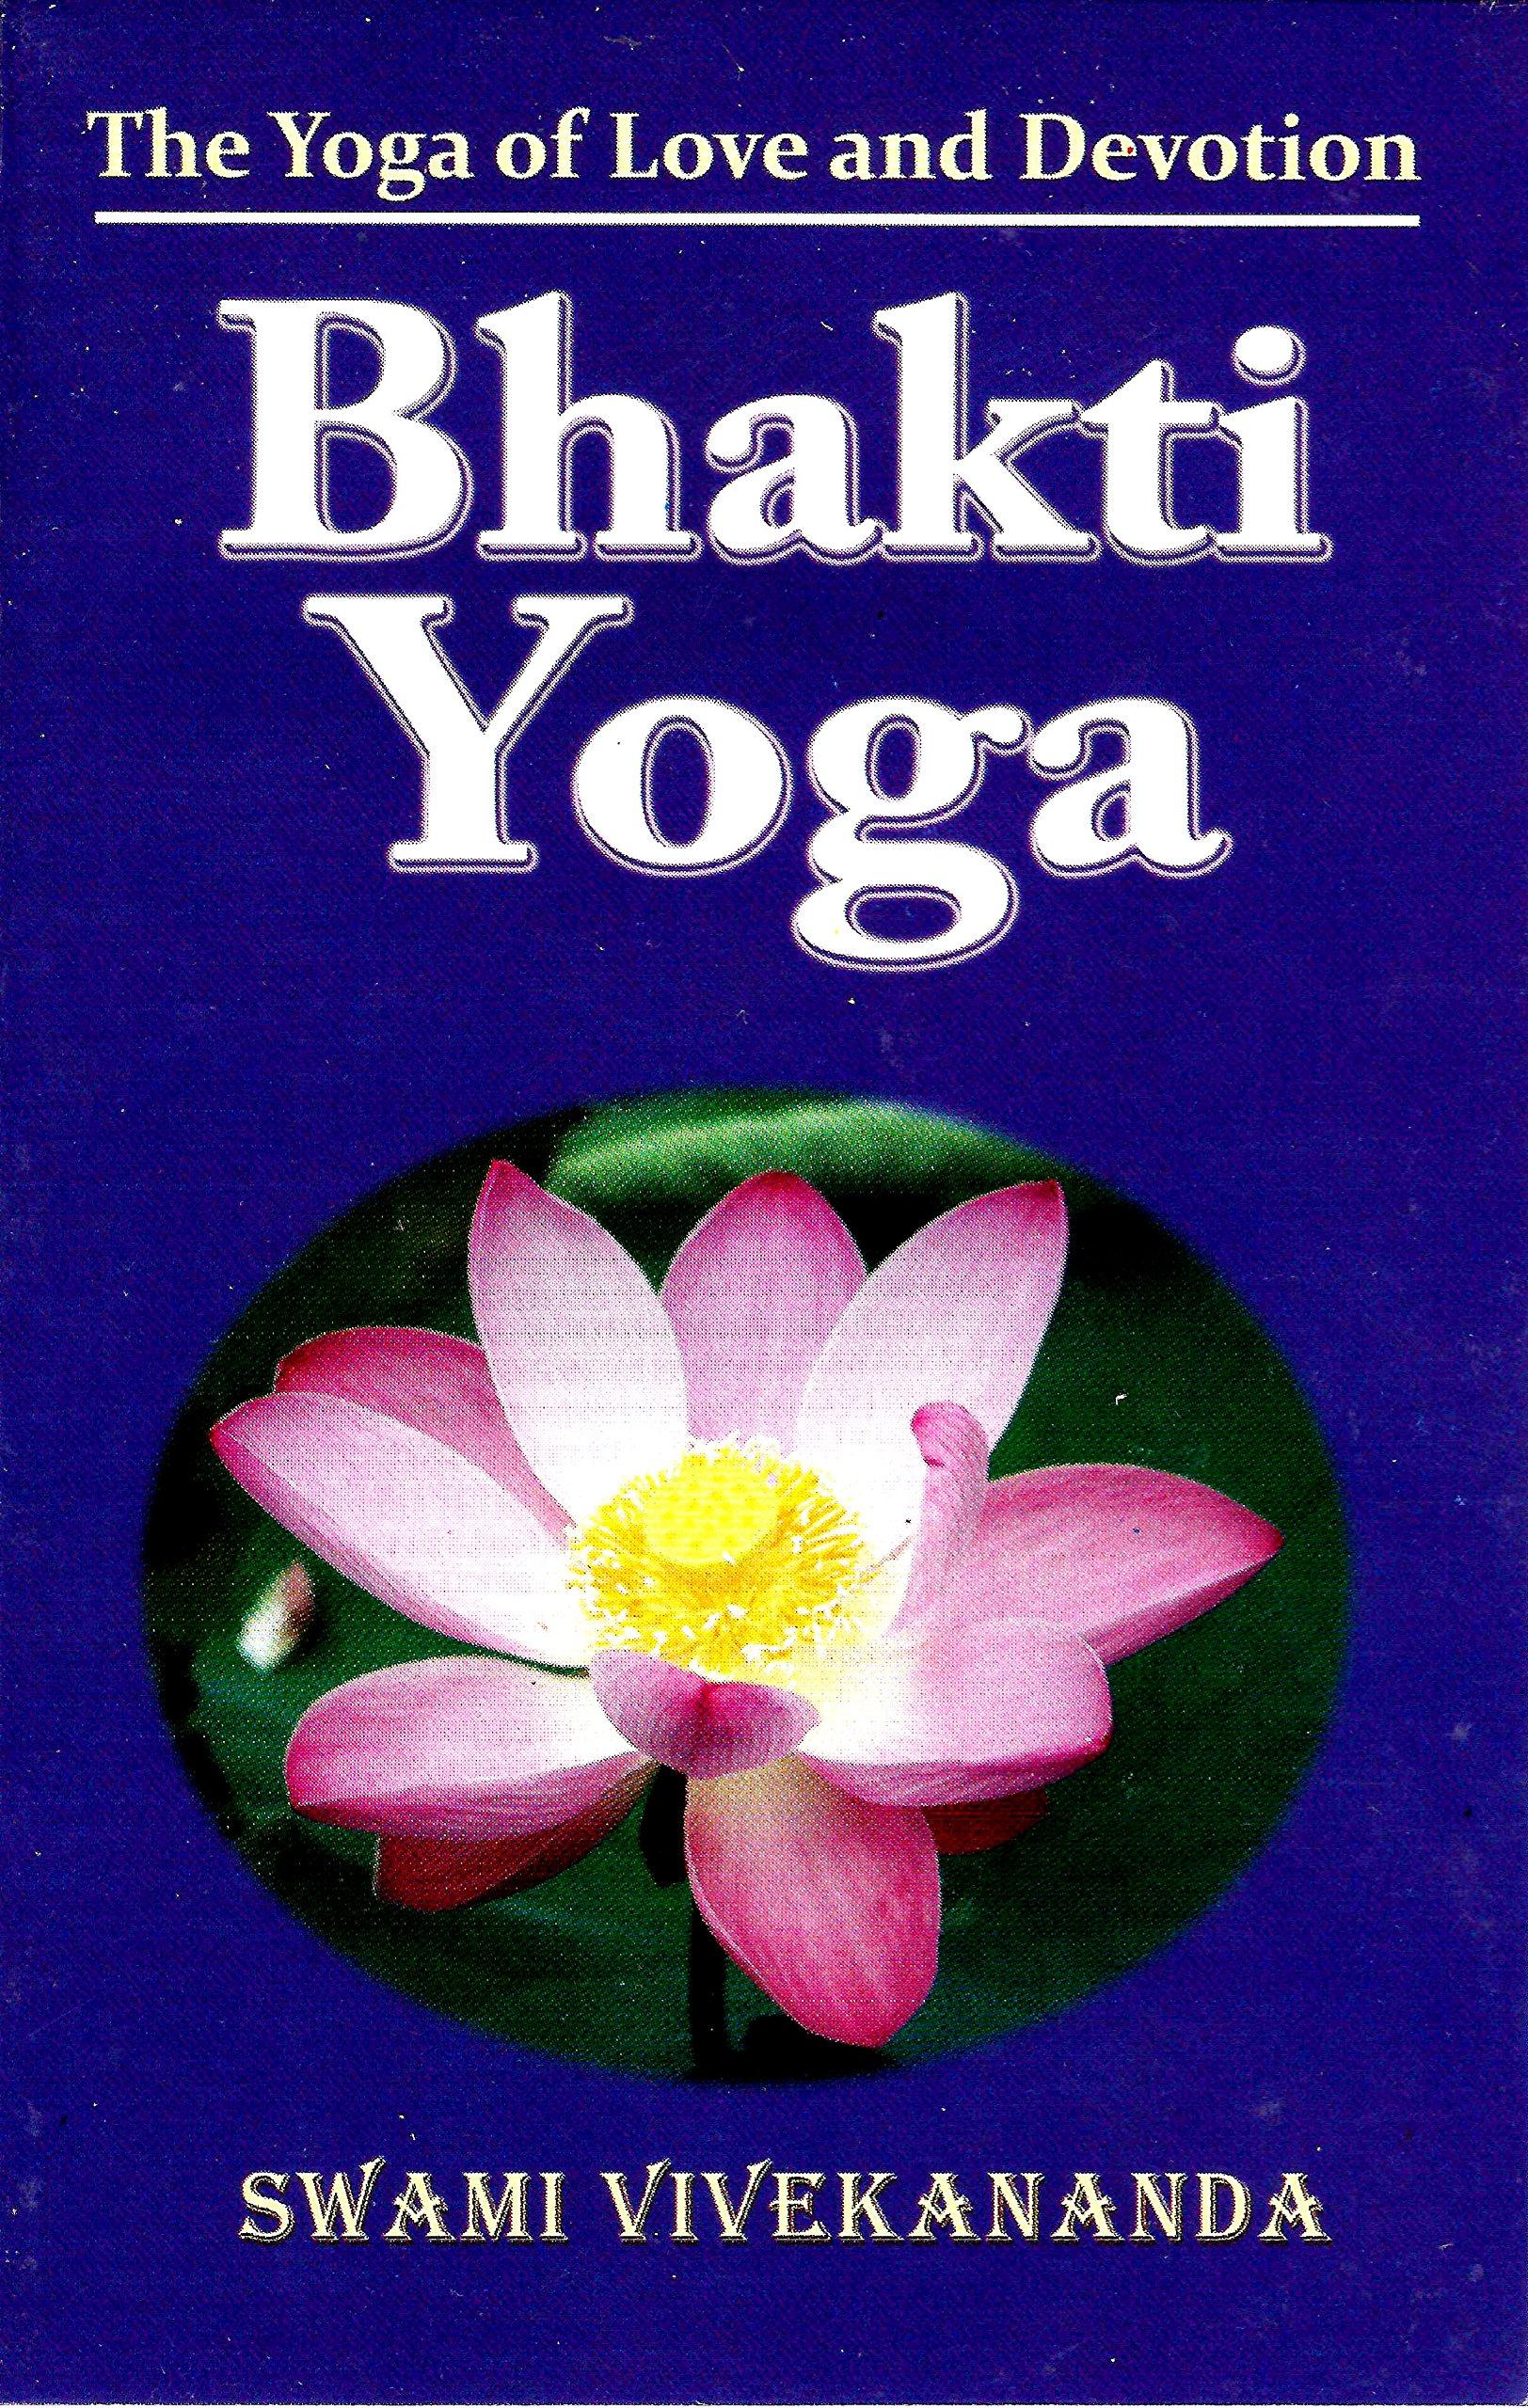 Bhakti Yoga The Yoga Of Love And Devotion Swami Vivekananda 9788185301976 Amazon Com Books